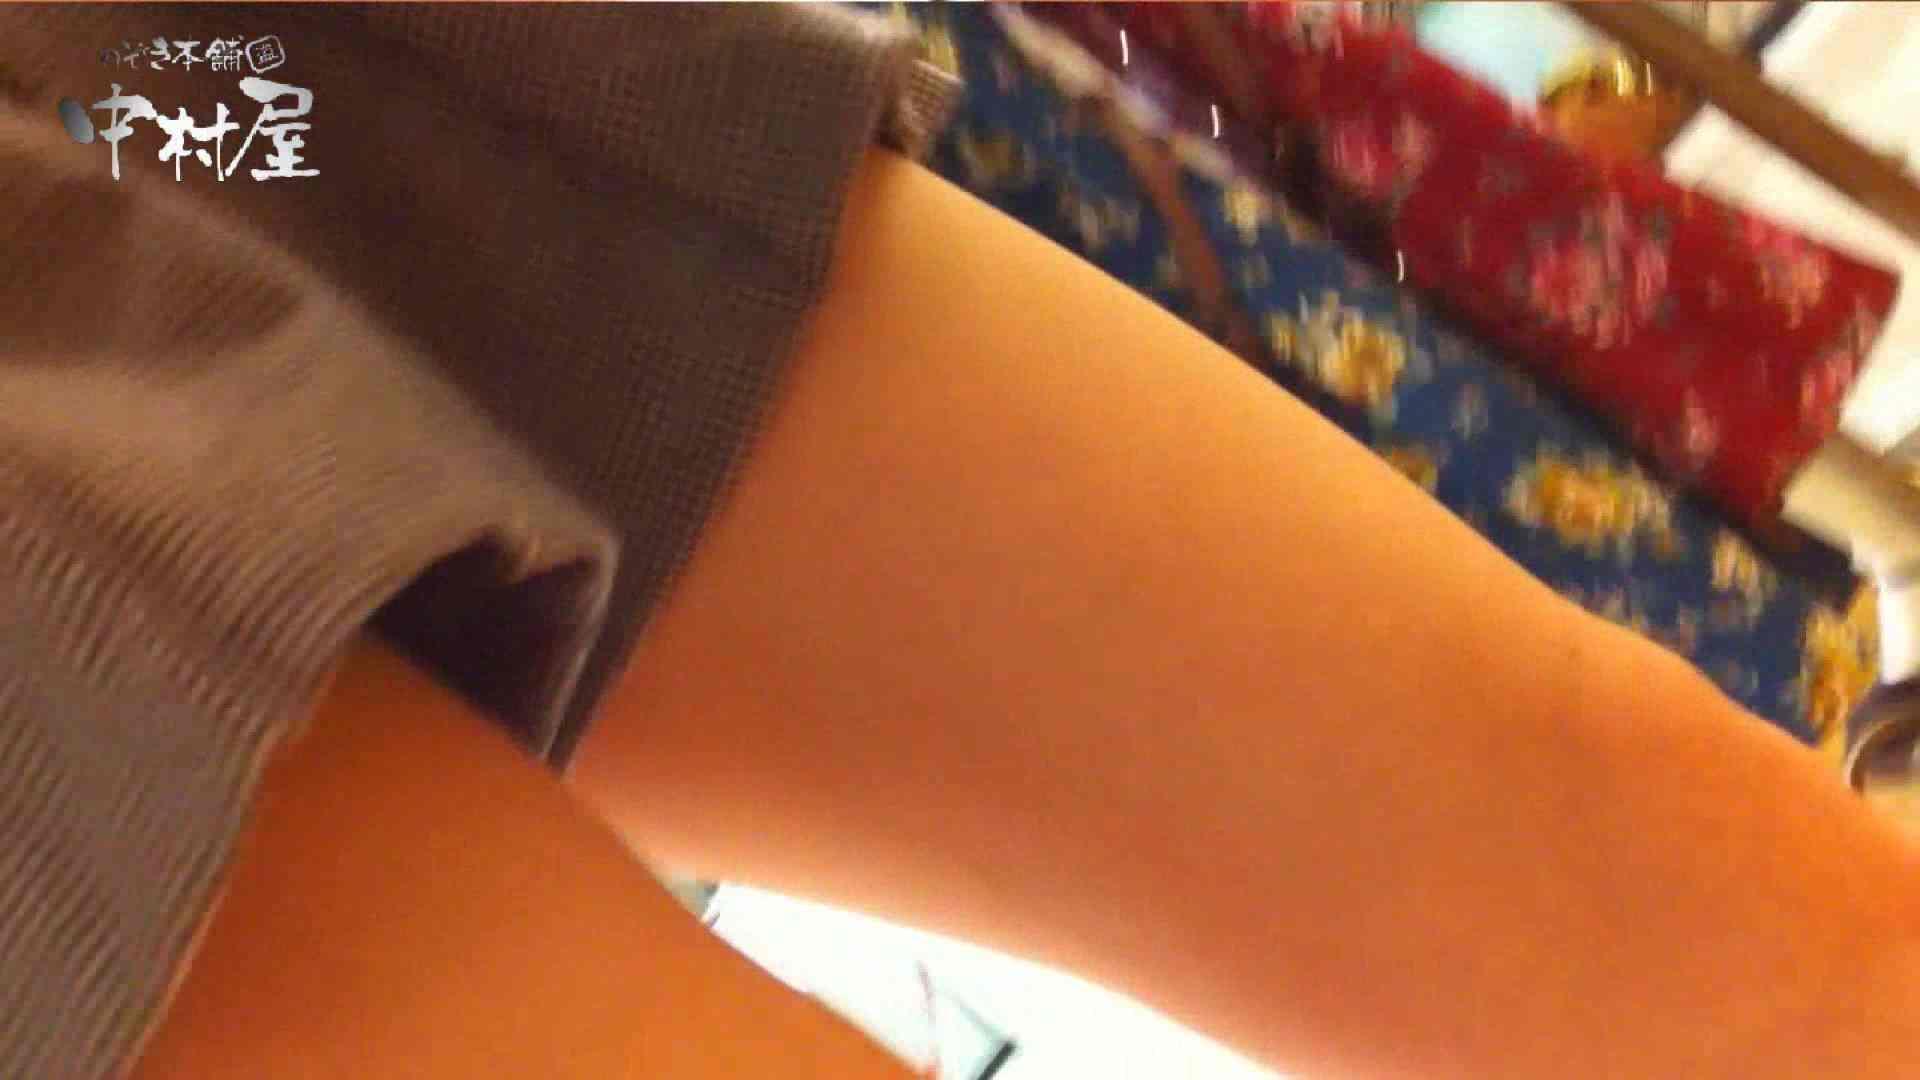 vol.45 可愛いカリスマ店員限定‼胸チラ&パンチラ 食い込みミッキーマウス! おまんこモロ出し   接写  107pic 14